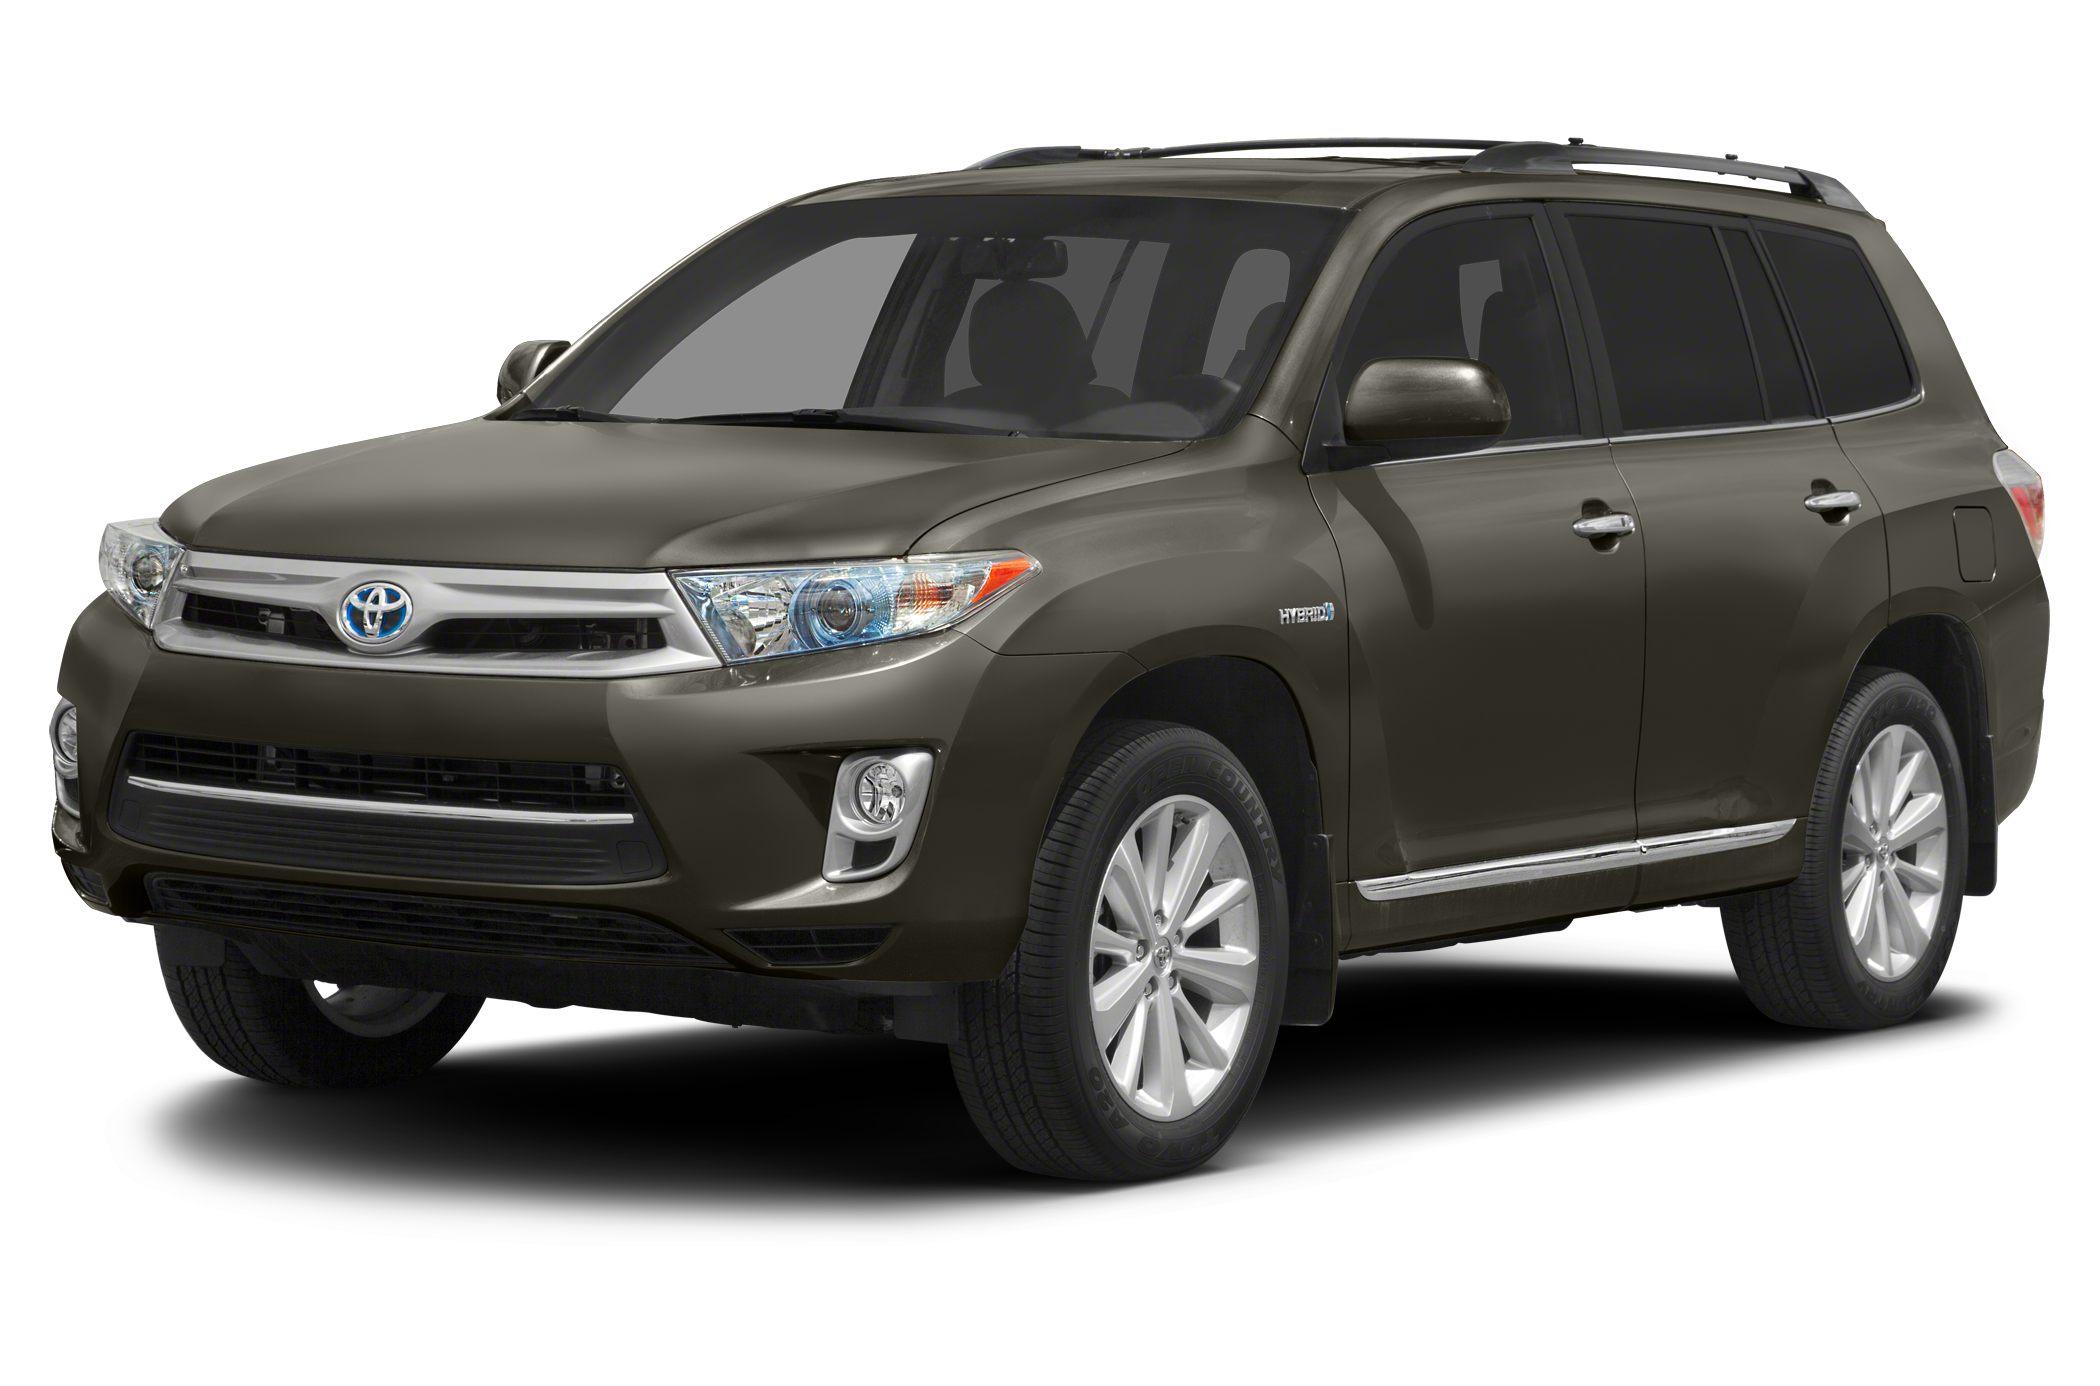 2012 Toyota Highlander Hybrid Limited CARFAX 1-Owner ONLY 21410 Miles EPA 28 MPG Hwy28 MPG Cit